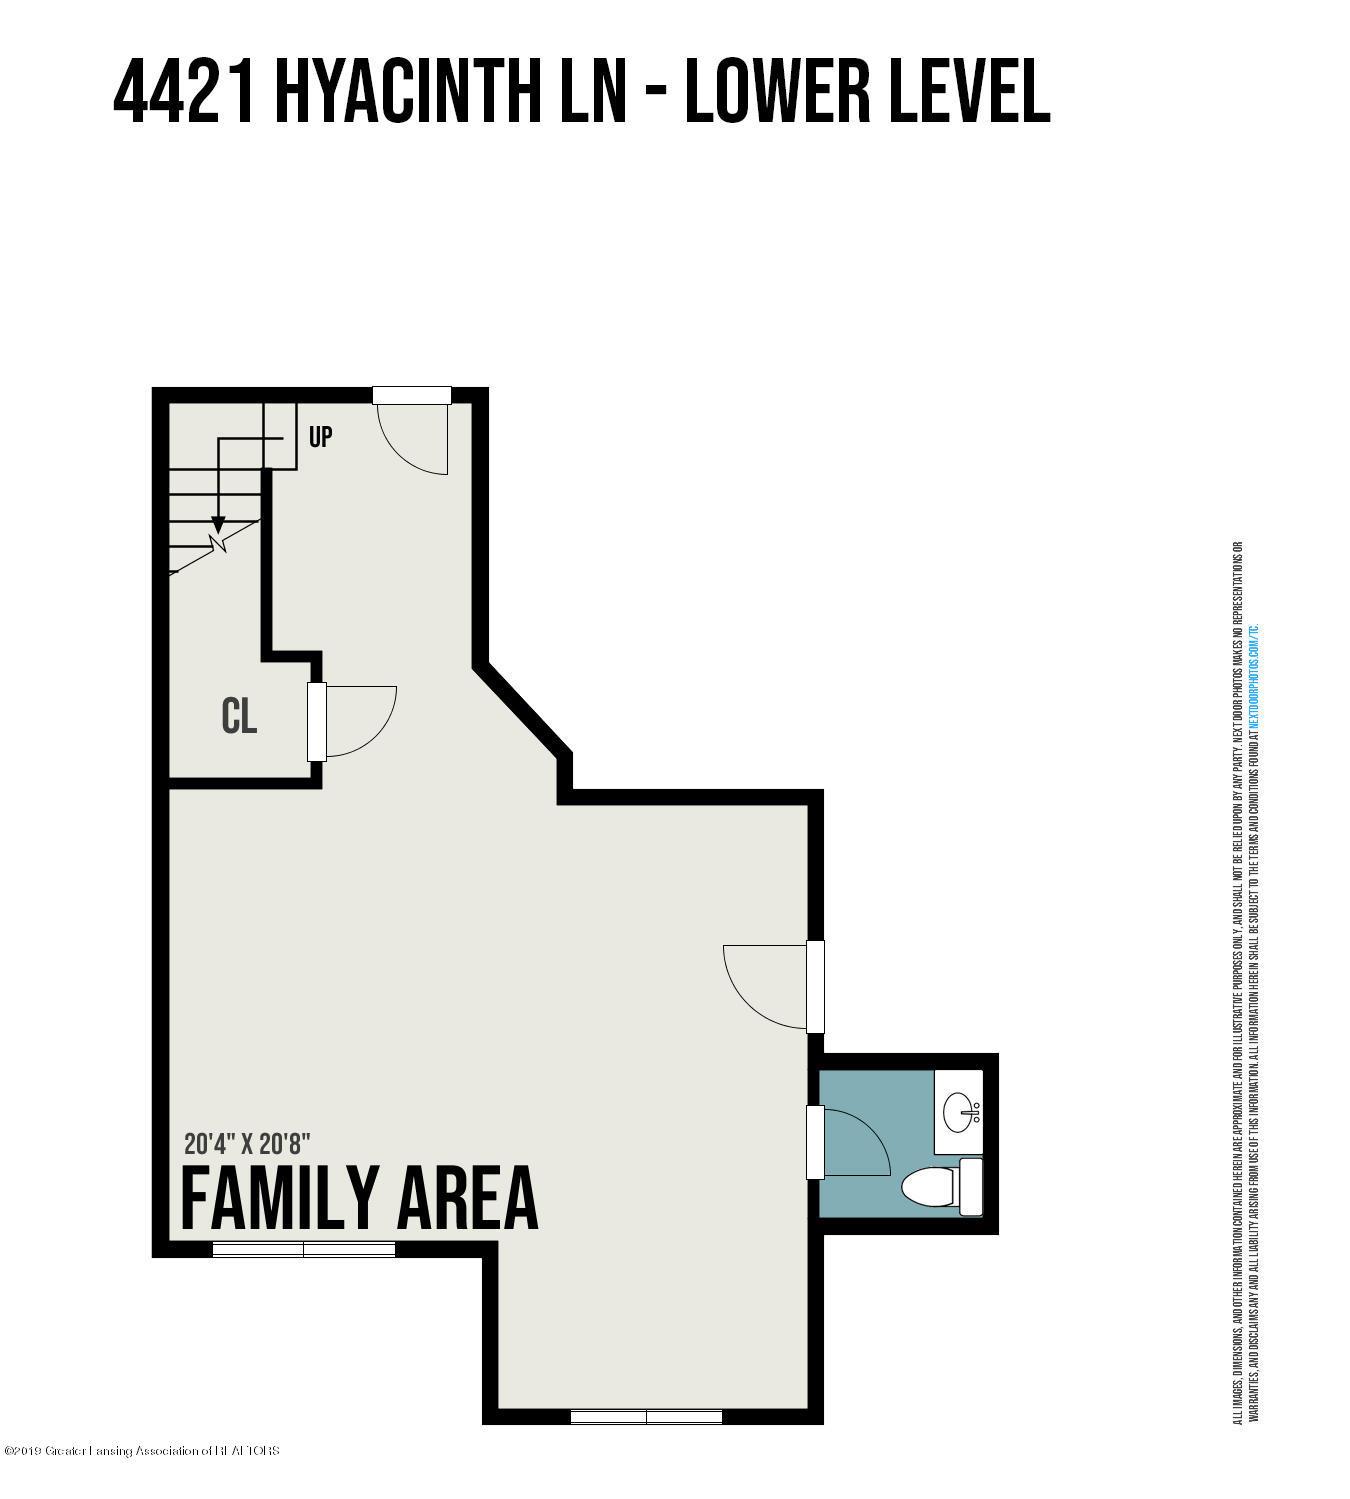 4421 Hyacinth Ln - Lower Level - 20